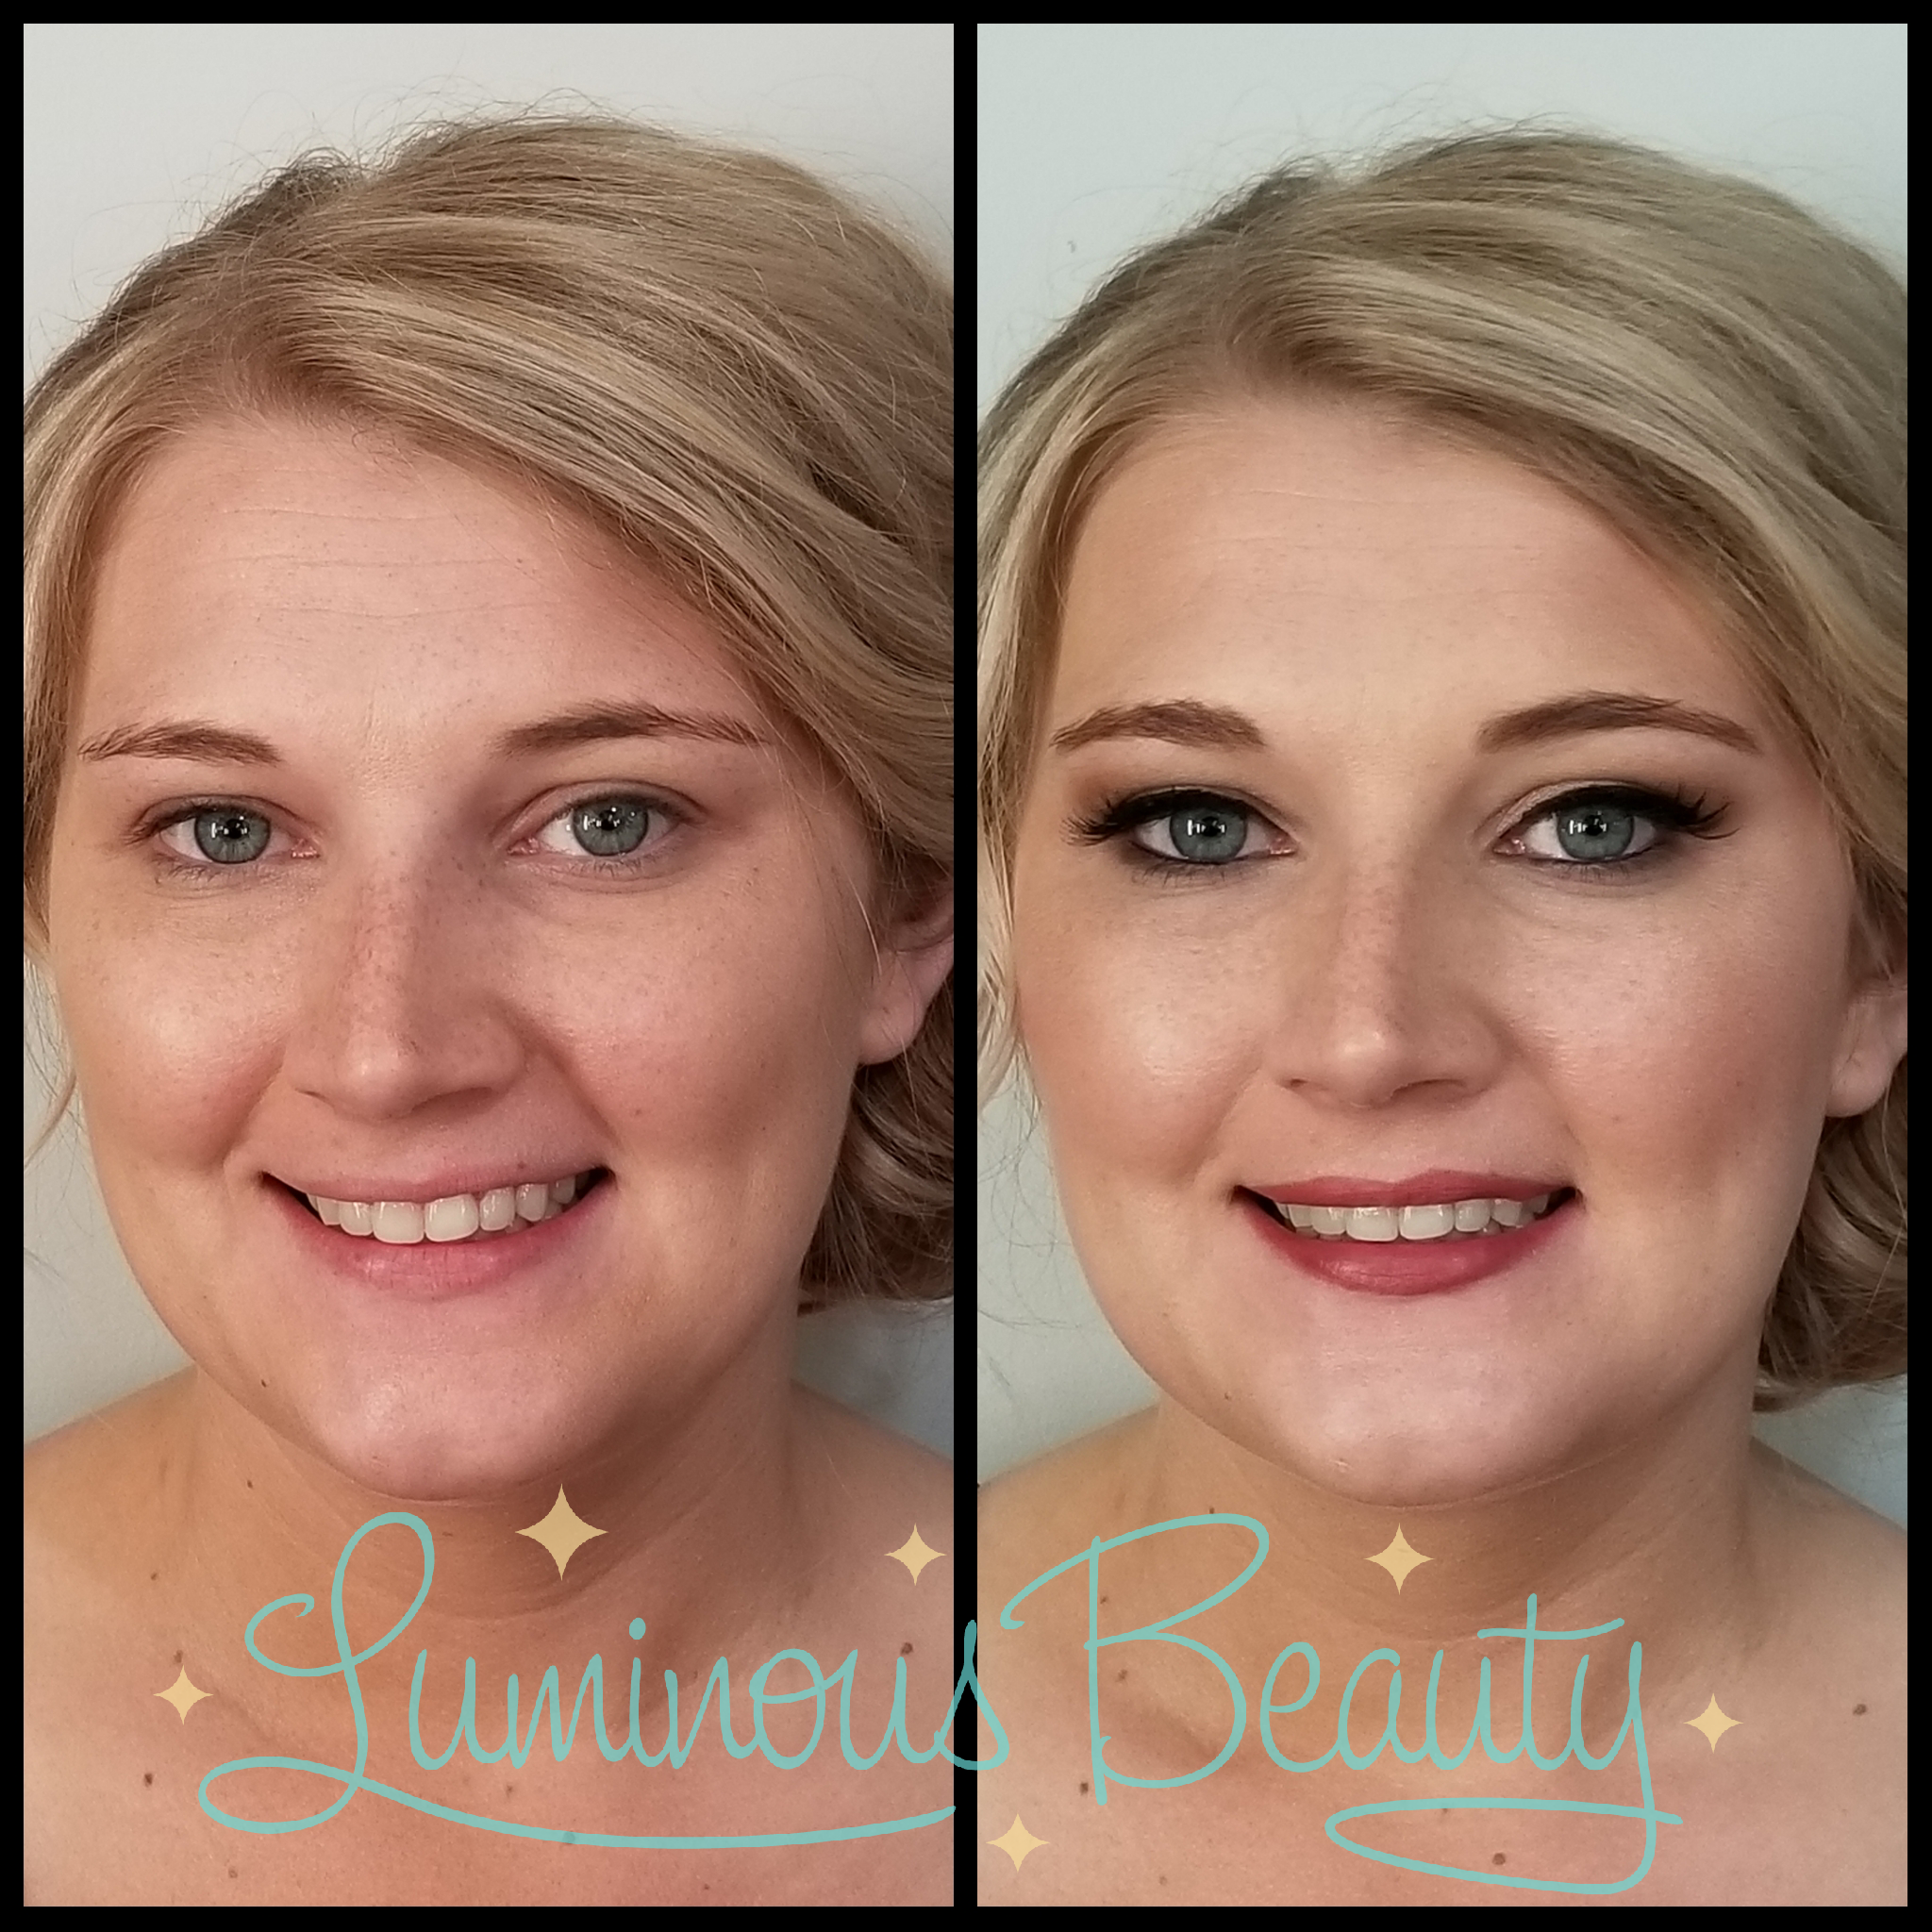 Bridesmaid Makeup. Airbrush Makeup. Clean Skin, Smokey Eye Makeup with False Lashes & Bold Lip. Luminous Beauty Makeup Artist..png